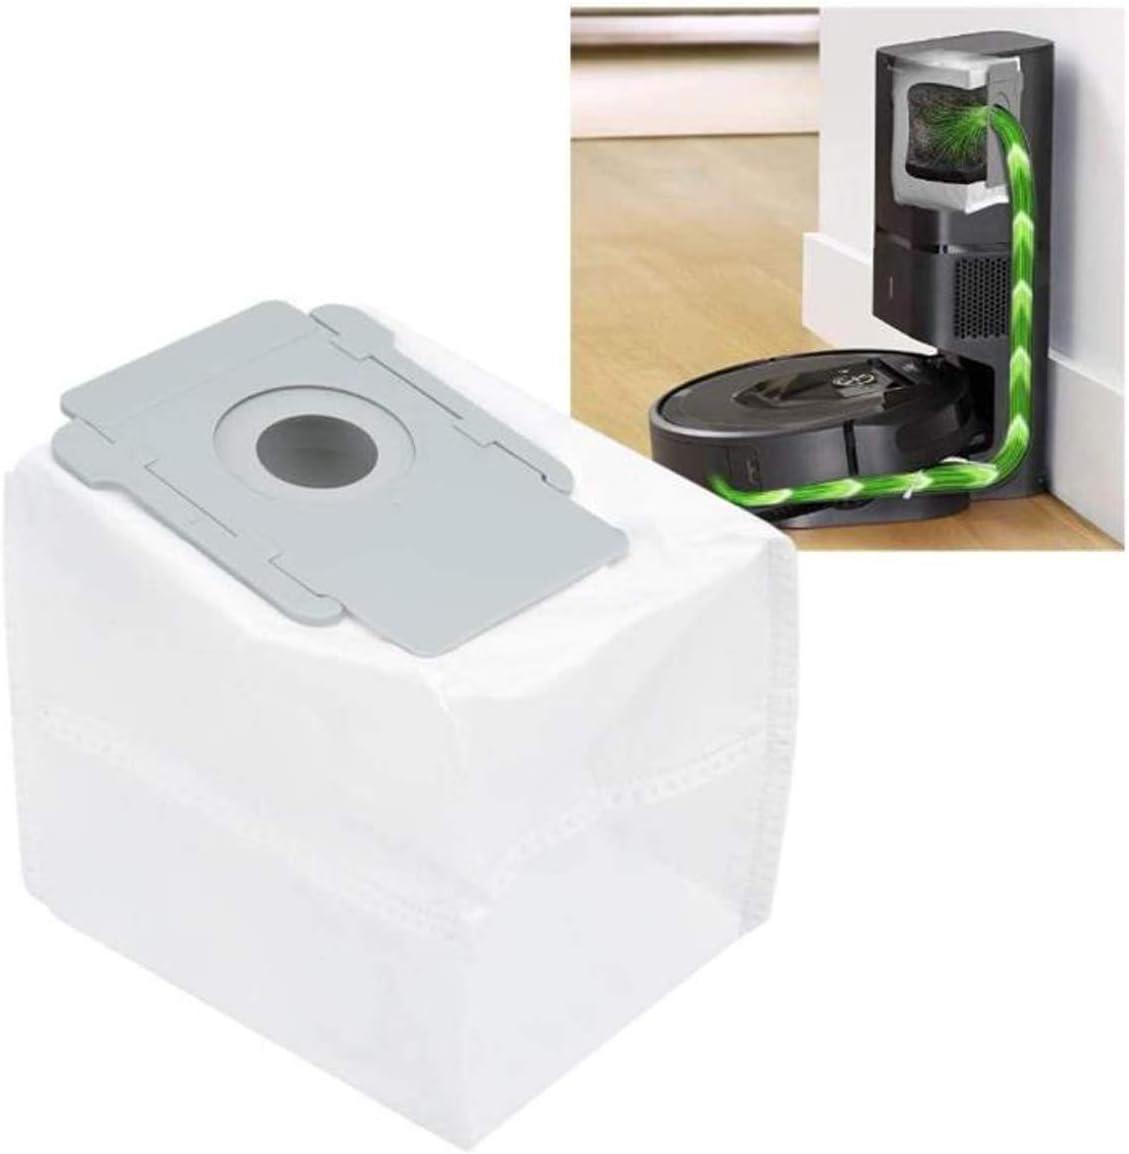 s9 + 9550 i7 // Plus 7150 7550 Nordun Paquete de 8 Bolsas de Vac/íO,Bolsas Eliminaci/ón autom/ática de suciedad Repuesto para iRobot Roomba i7 E5 E6 S9 S9+//S9 Plus Series Aspiradora Robot